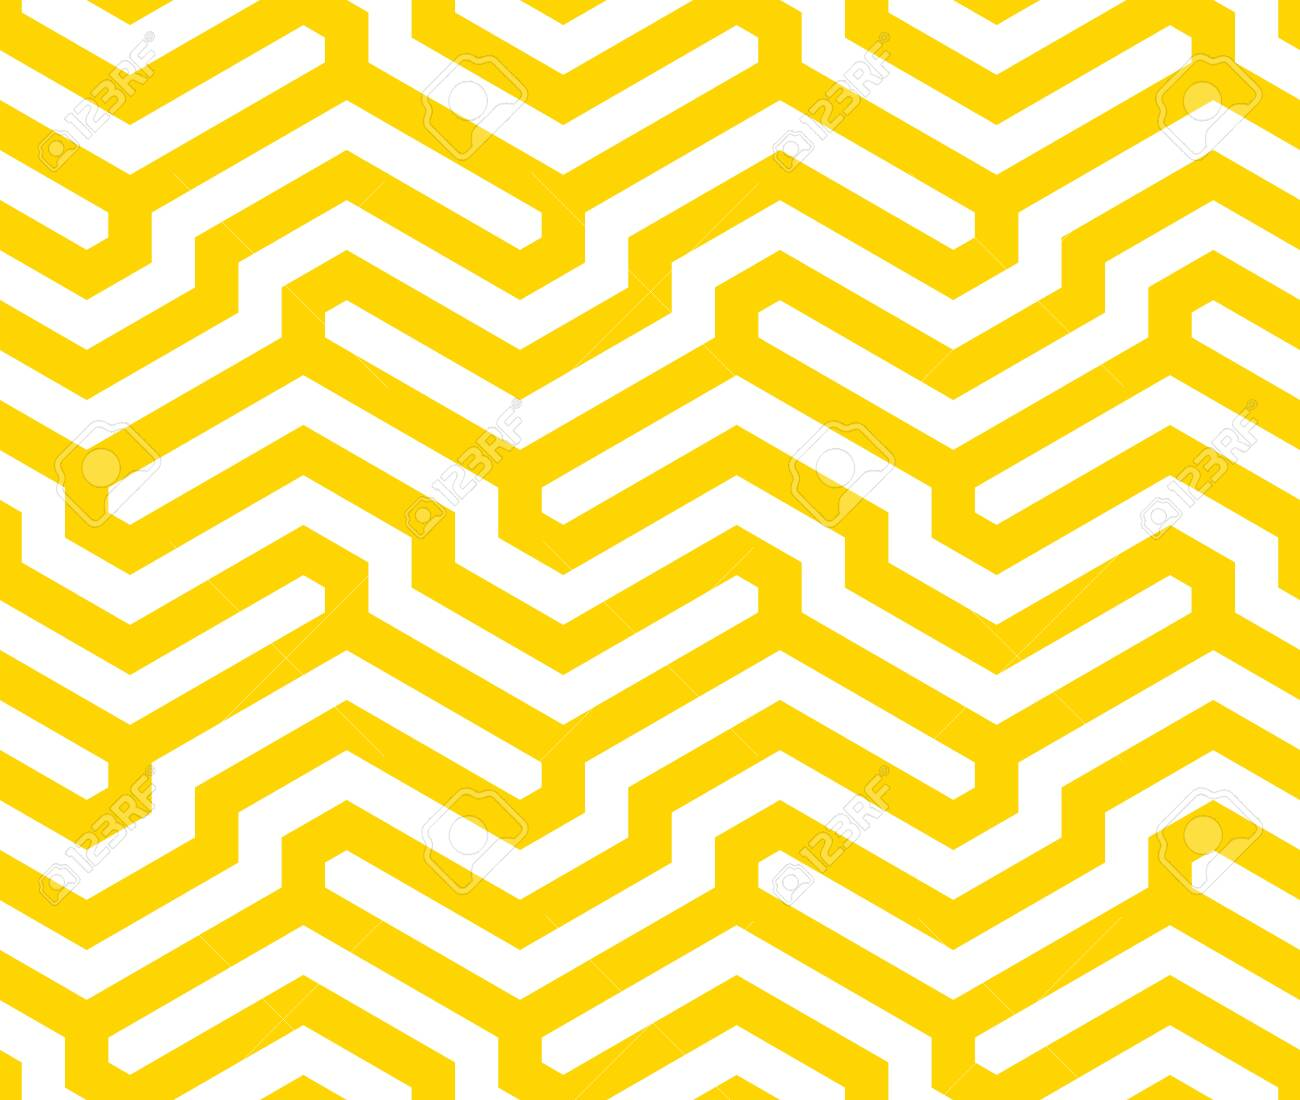 Vector yellow geometric pattern. Seamless modern linear texture. - 145855256